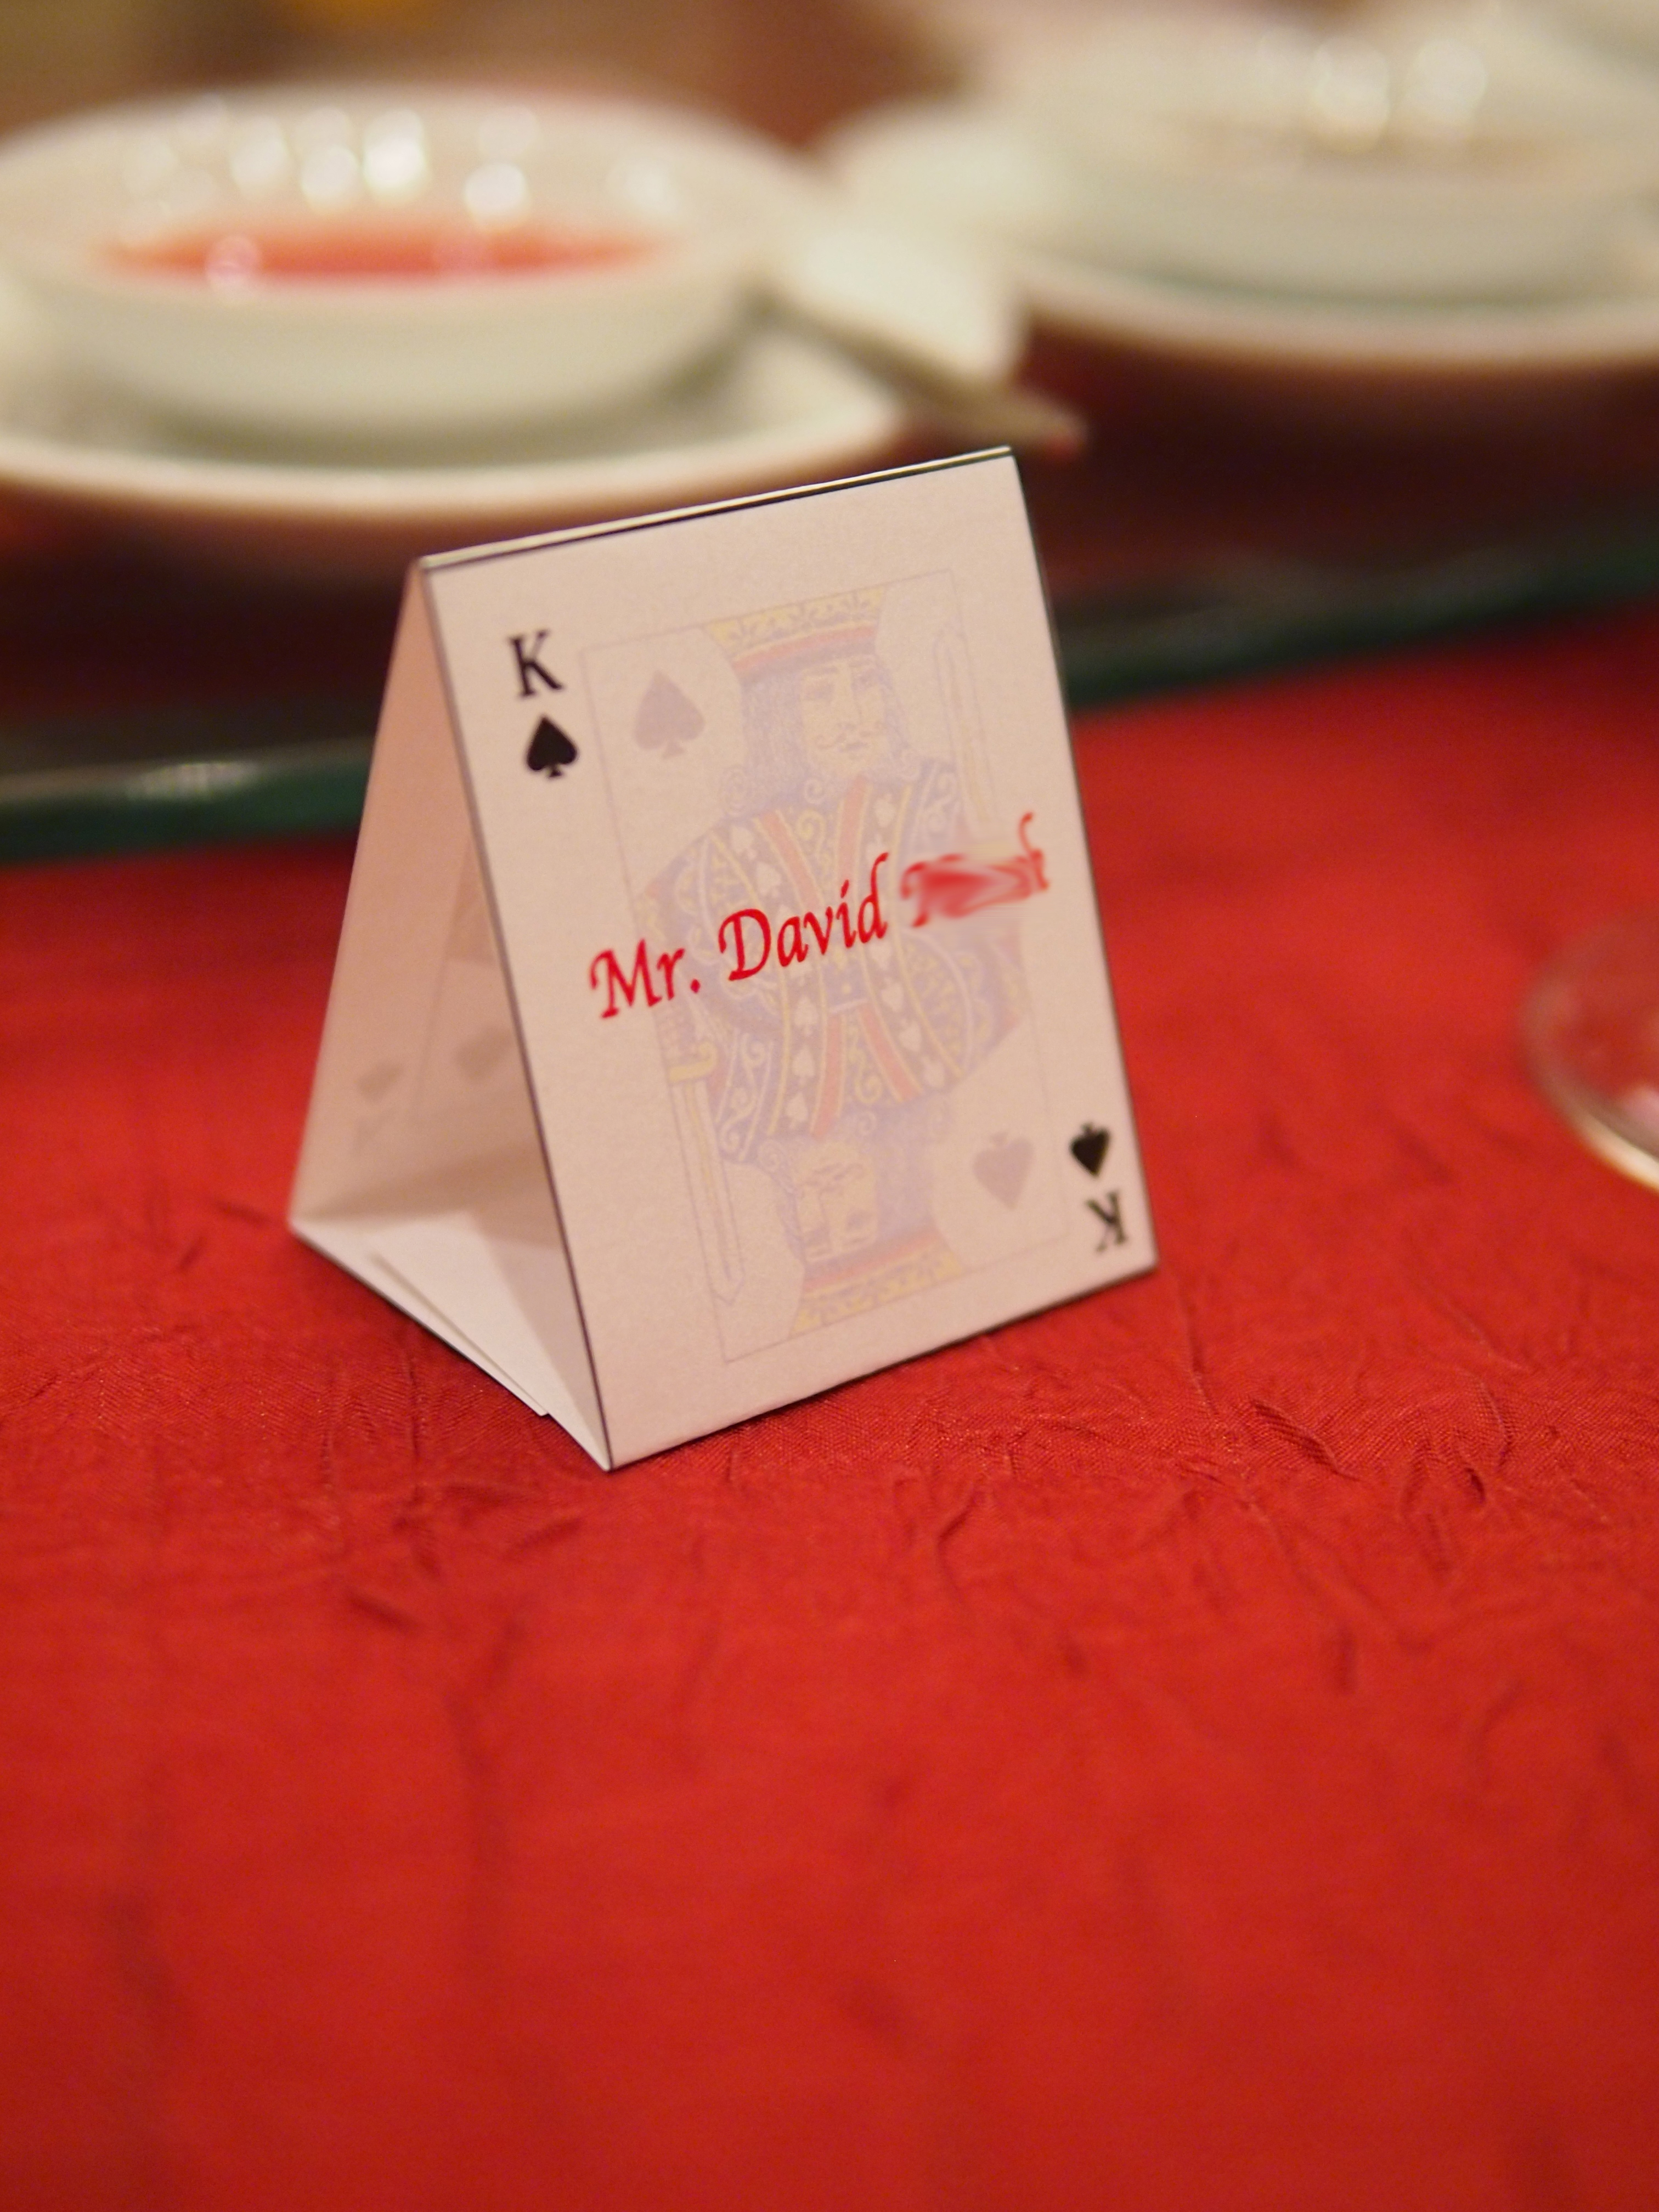 A Casino Royale Celebration With Family